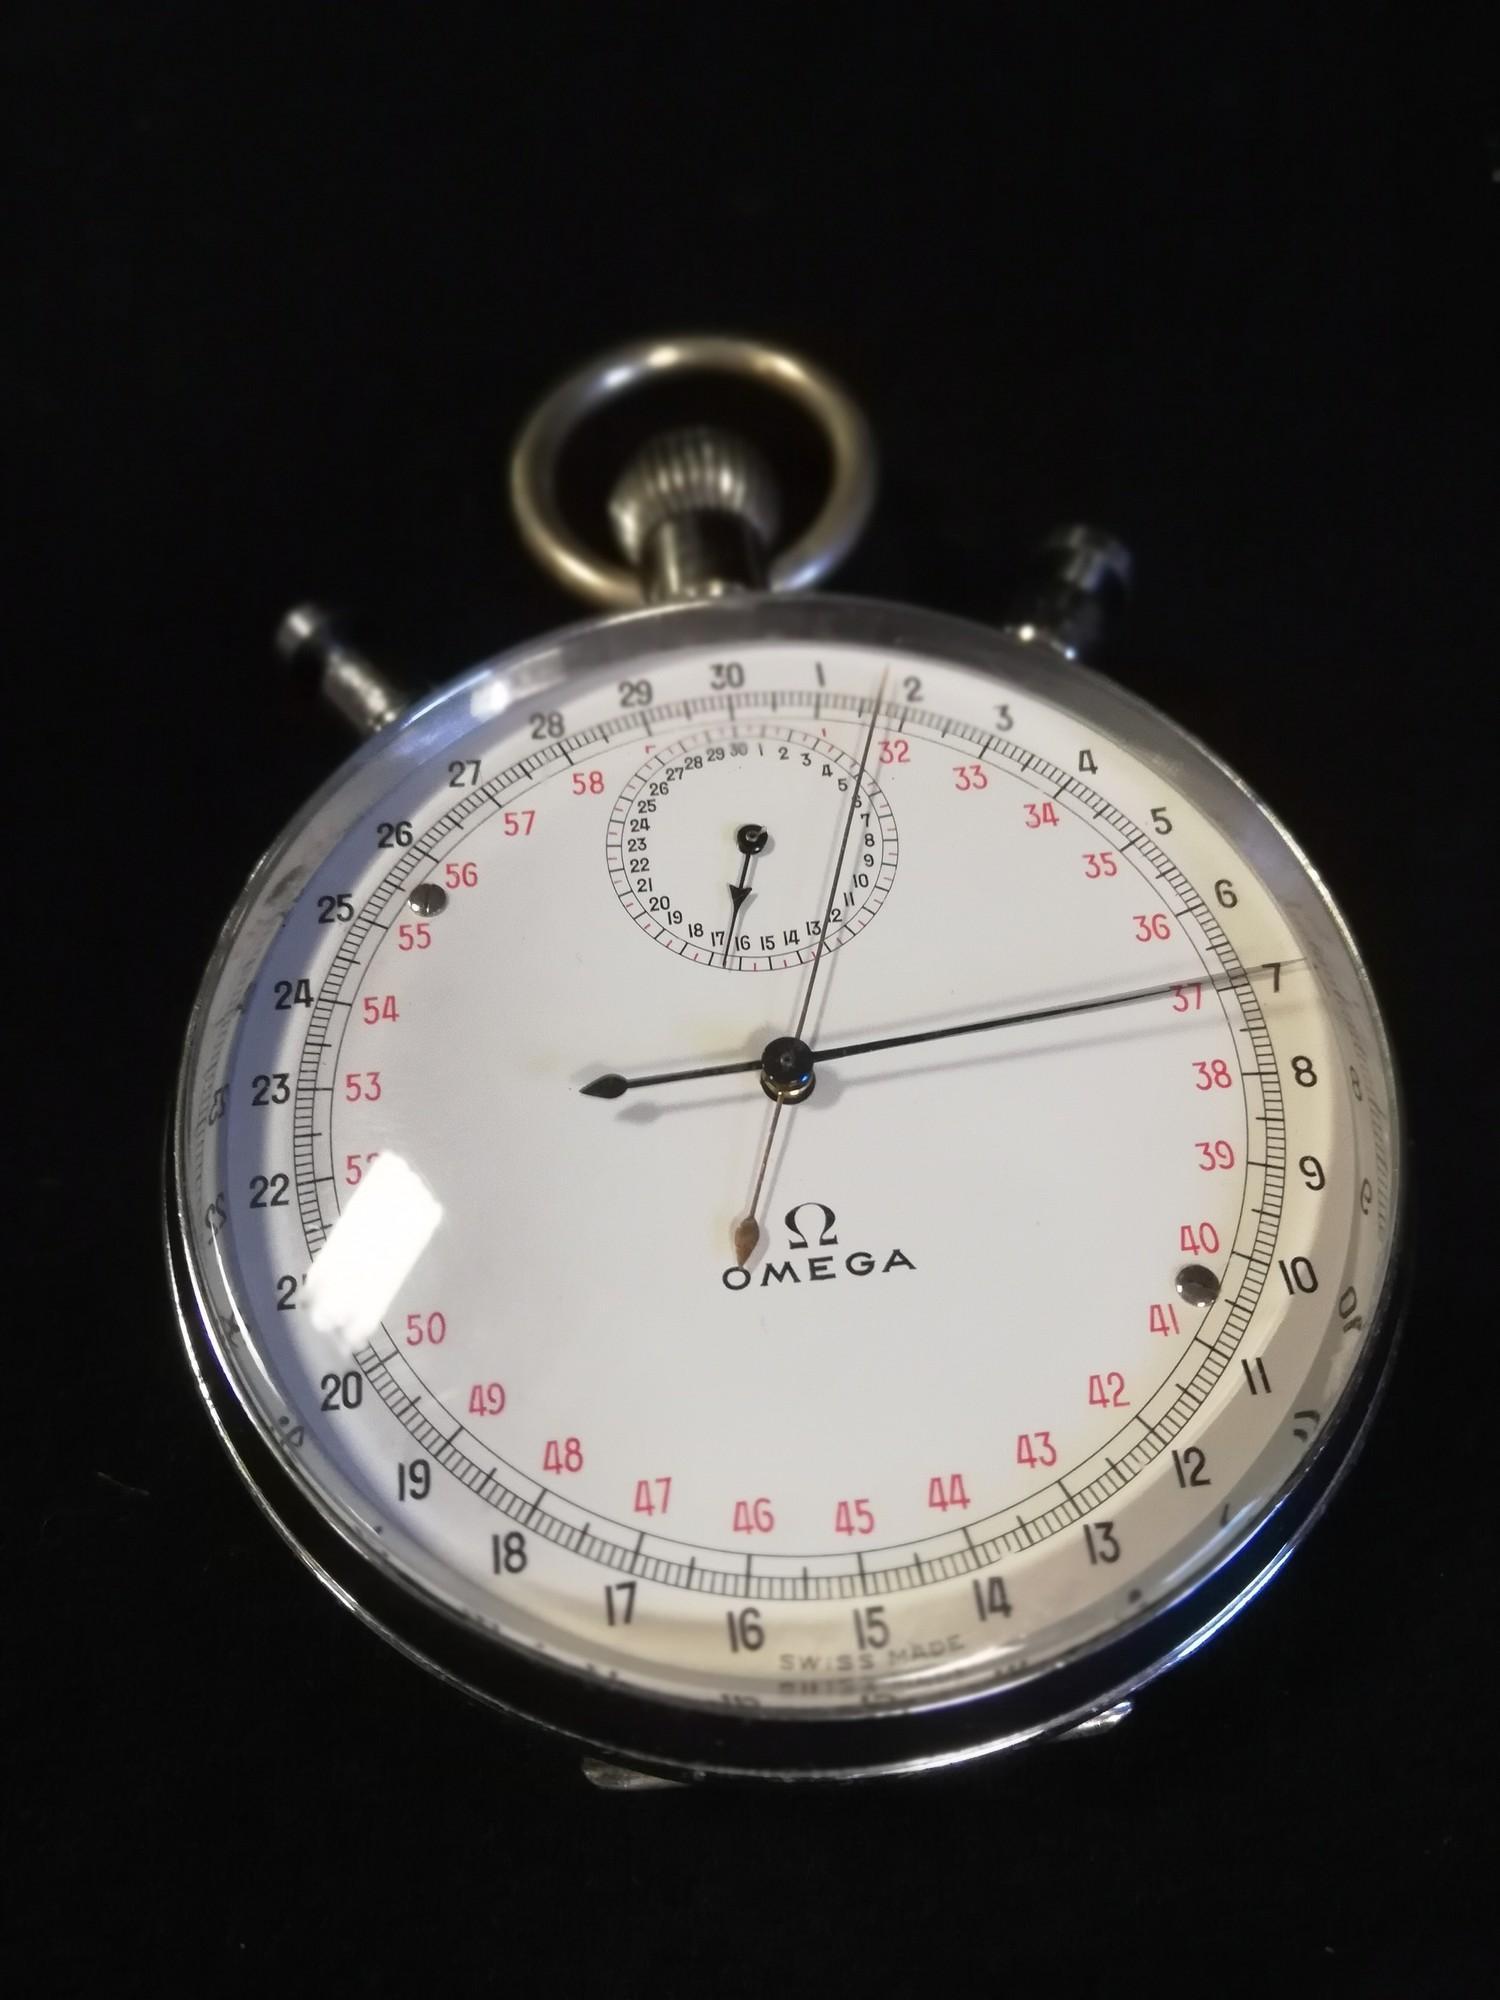 Omega split second stopwatch in chrome case